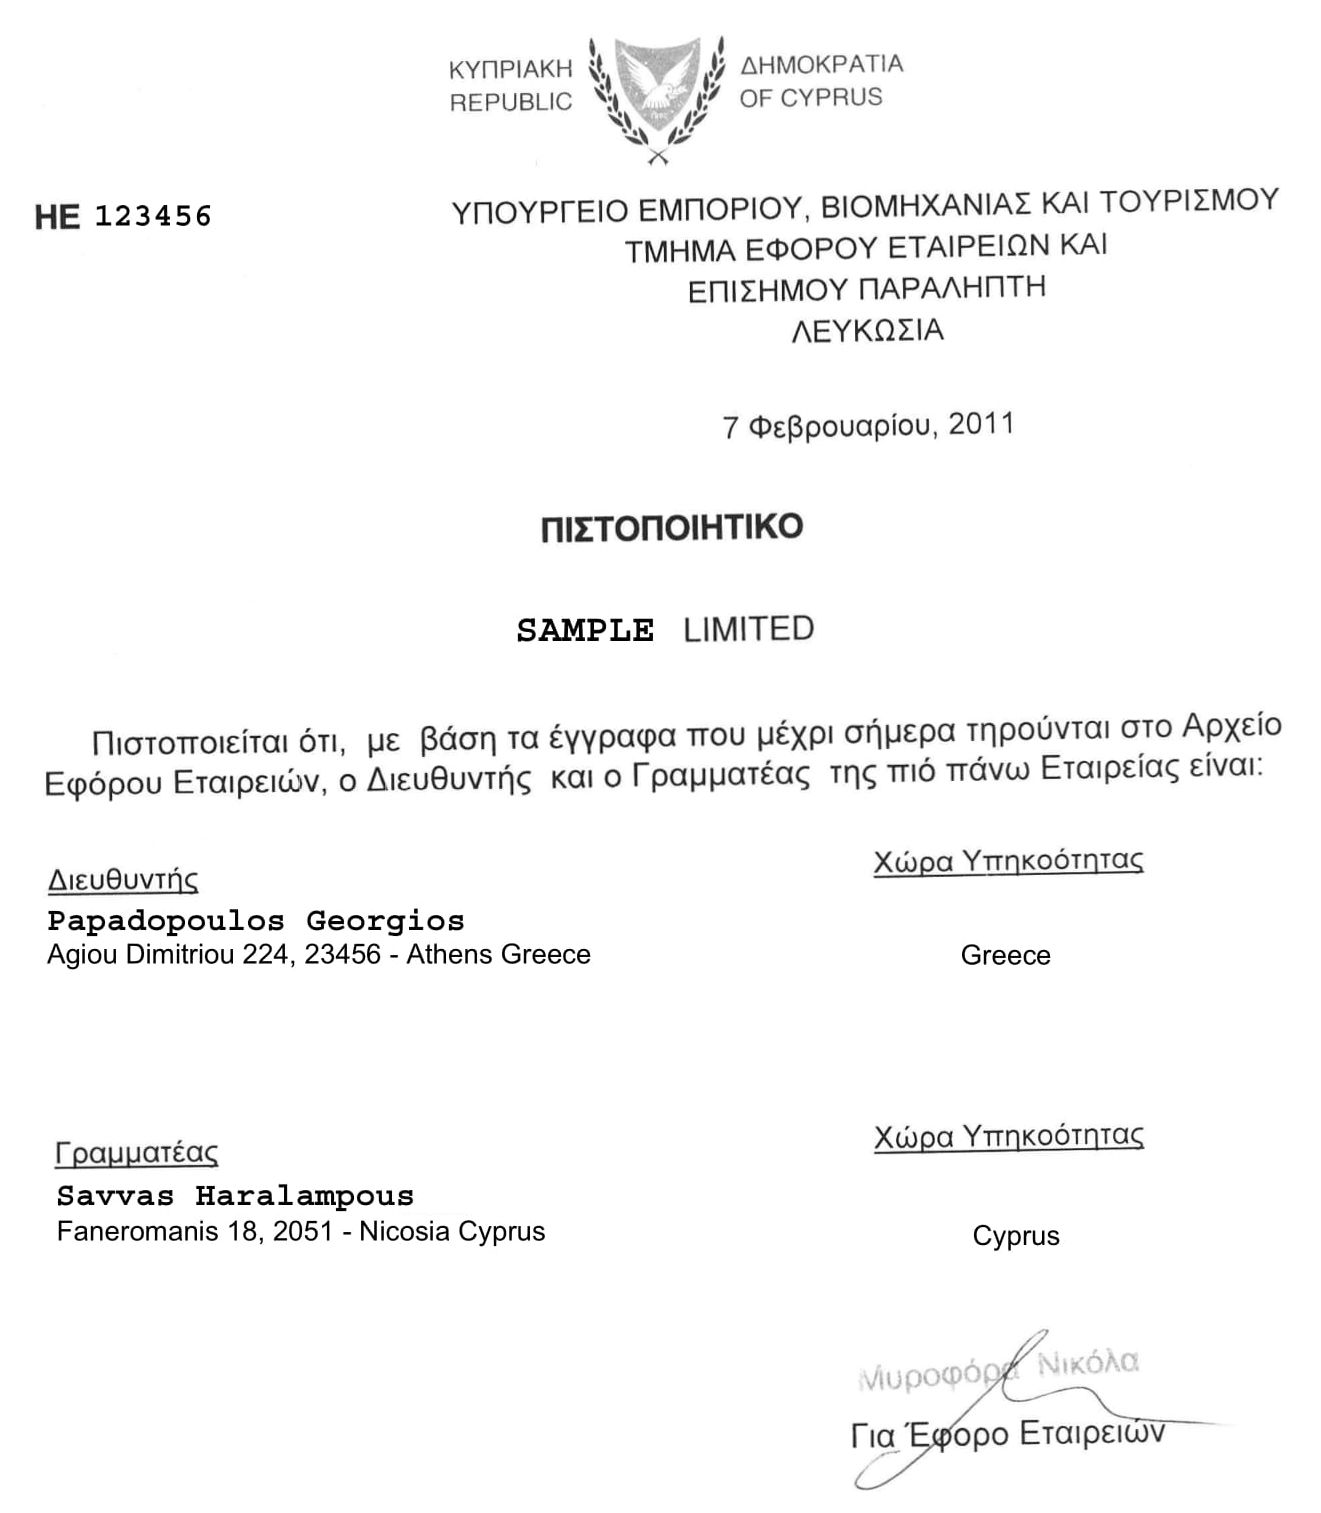 образец сертификата о директорах и секретаре Certificate of directors and secretary Кипр на греческом языке